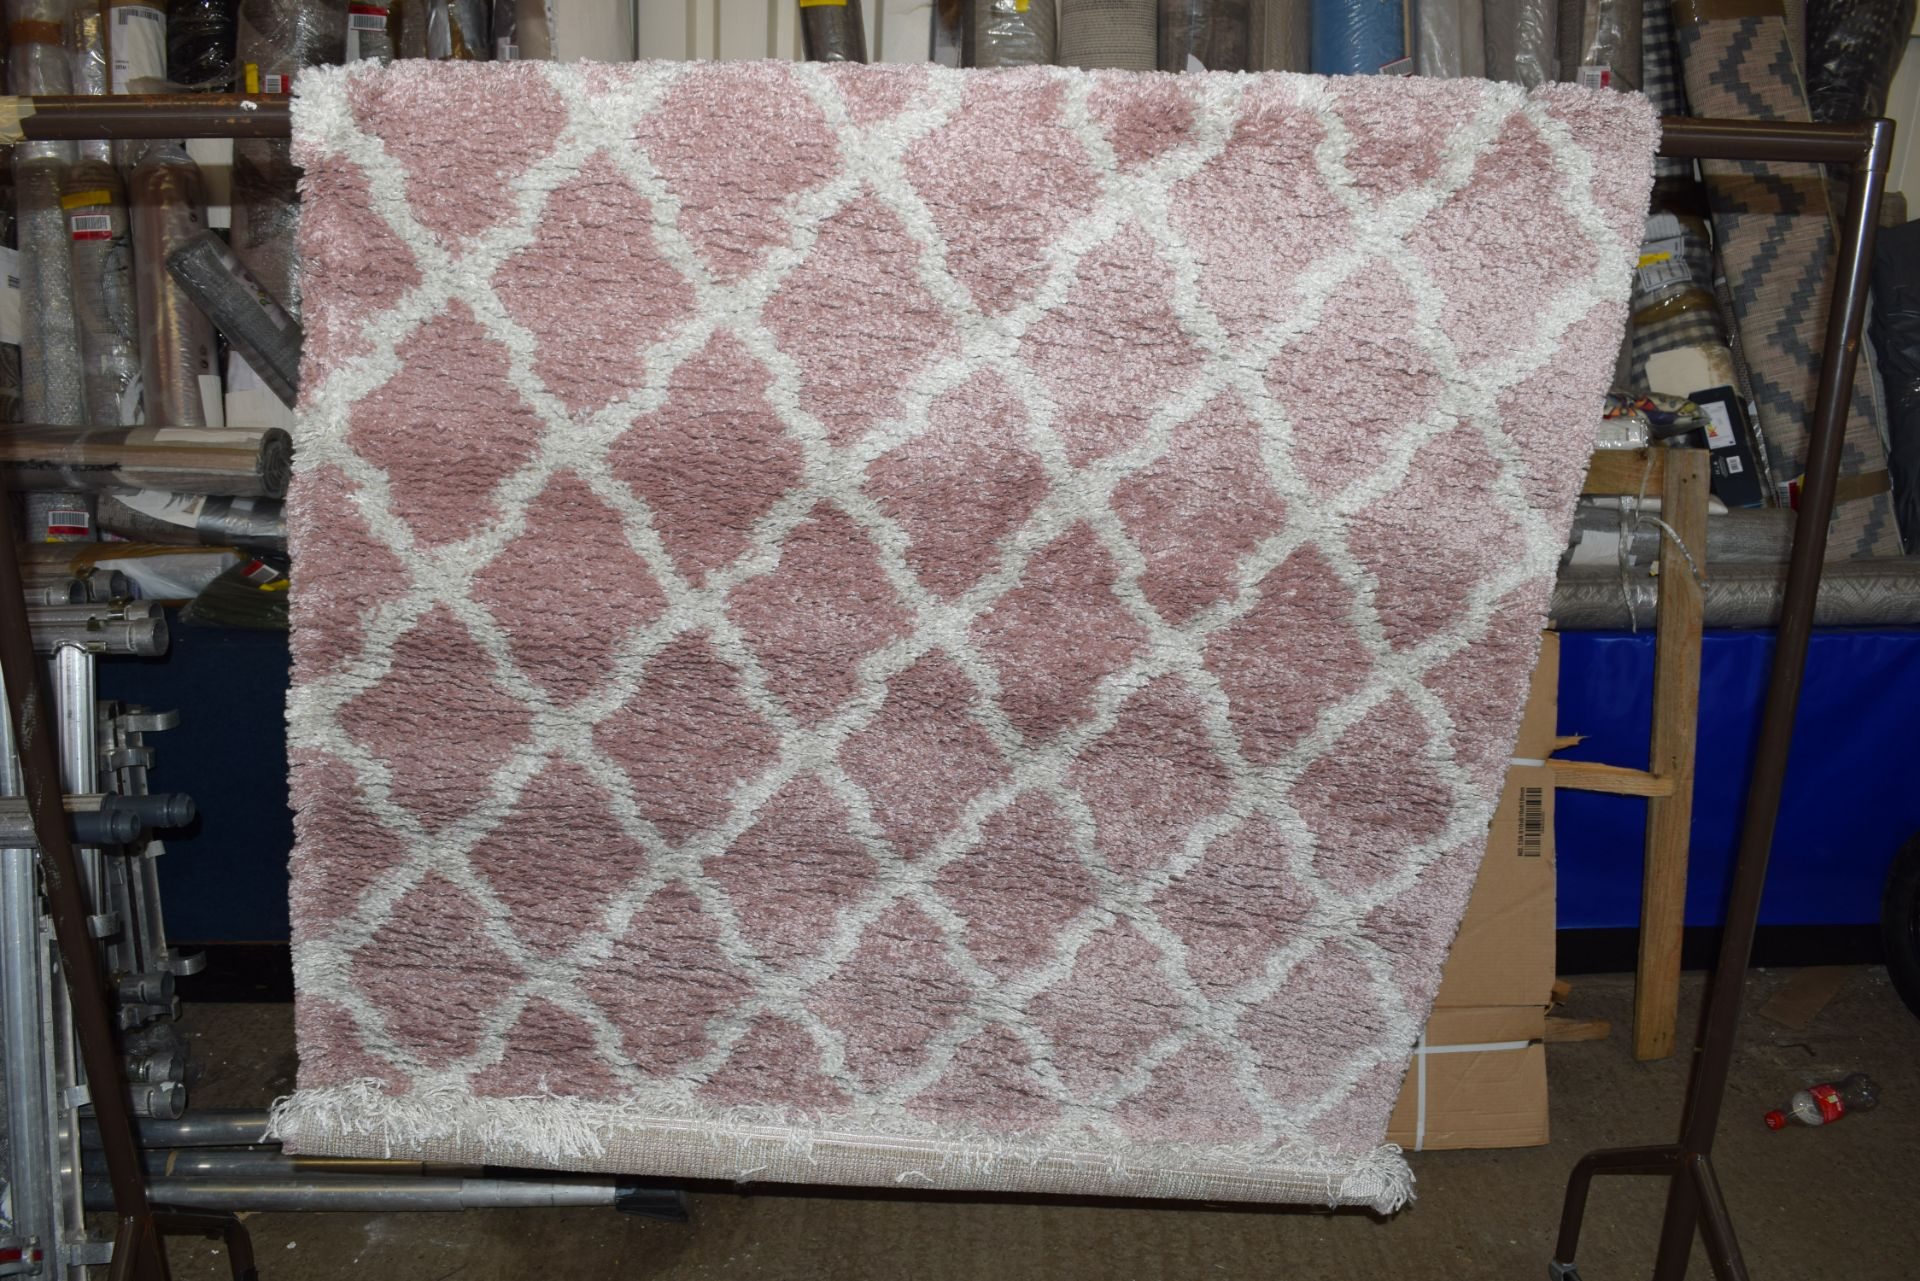 Desire rug, pink/cream, 120 x 170cm - Image 2 of 2